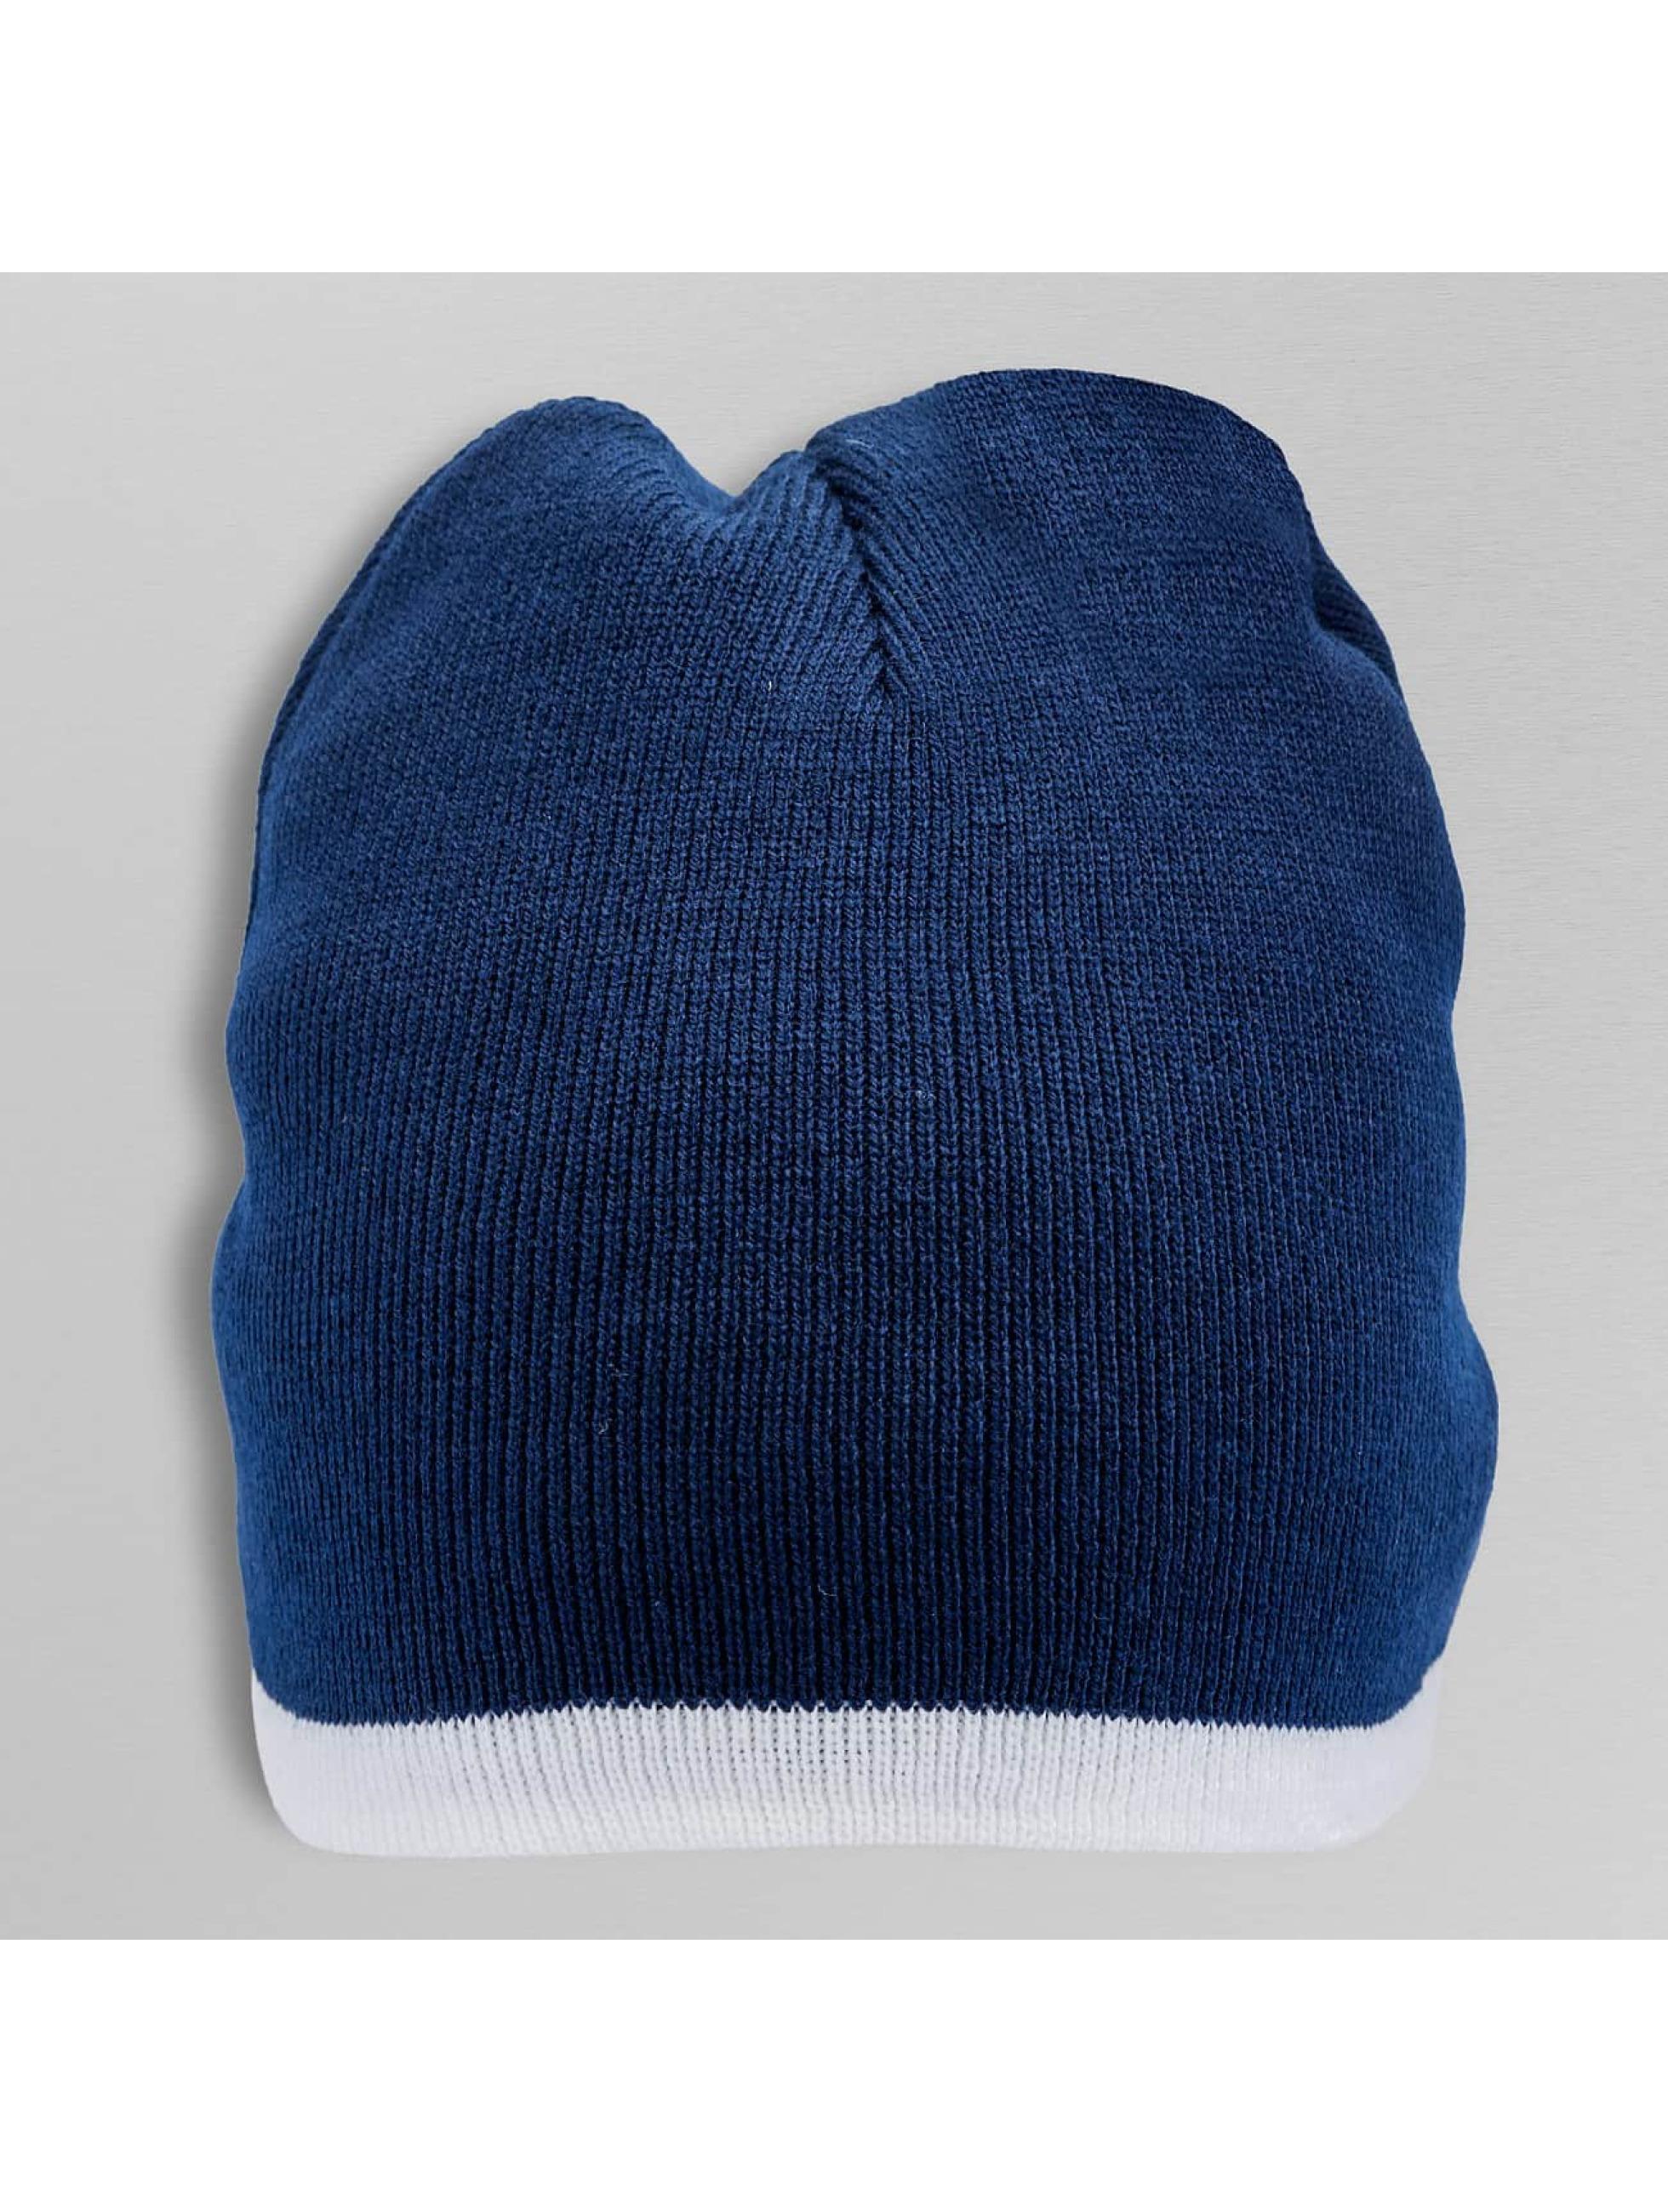 Cap Crony Männer,Frauen Beanie Single Striped in blau